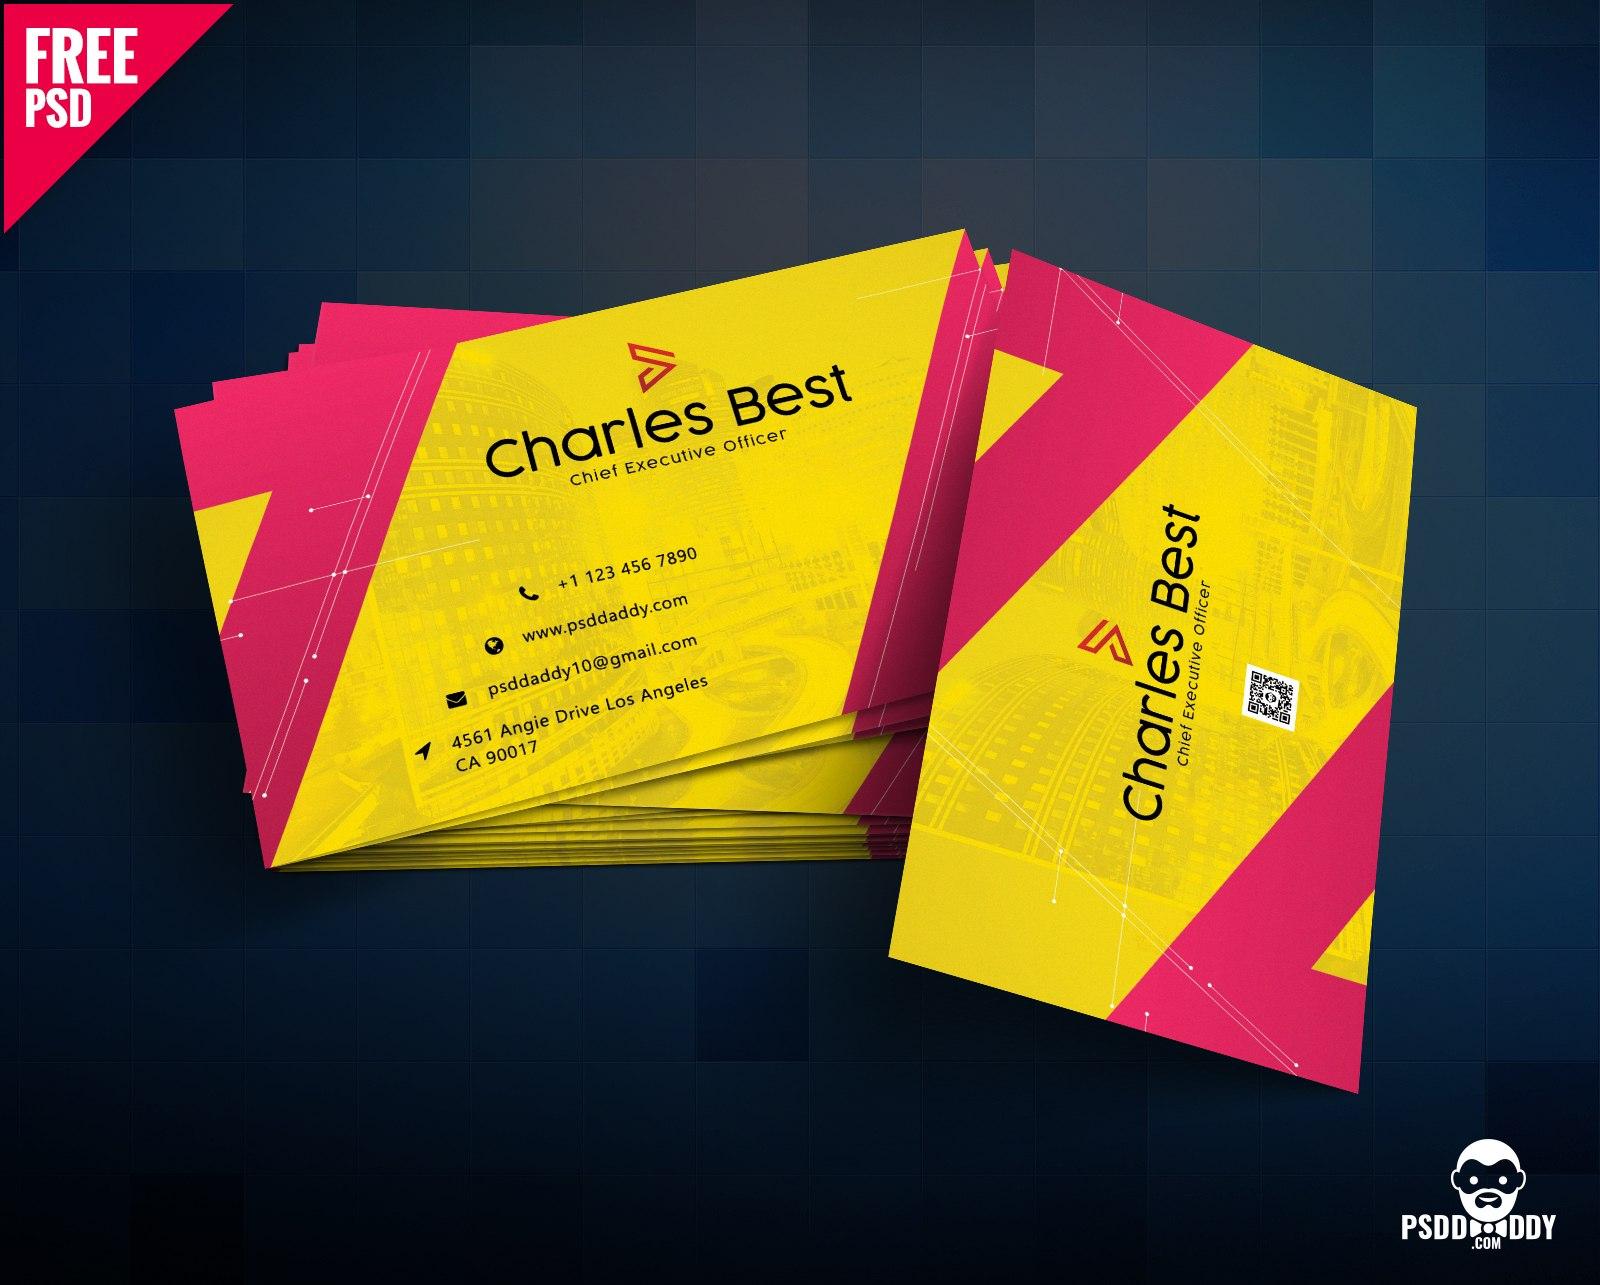 Download Creative Business Card Free Psd  Psddaddy Regarding Business Card Size Psd Template